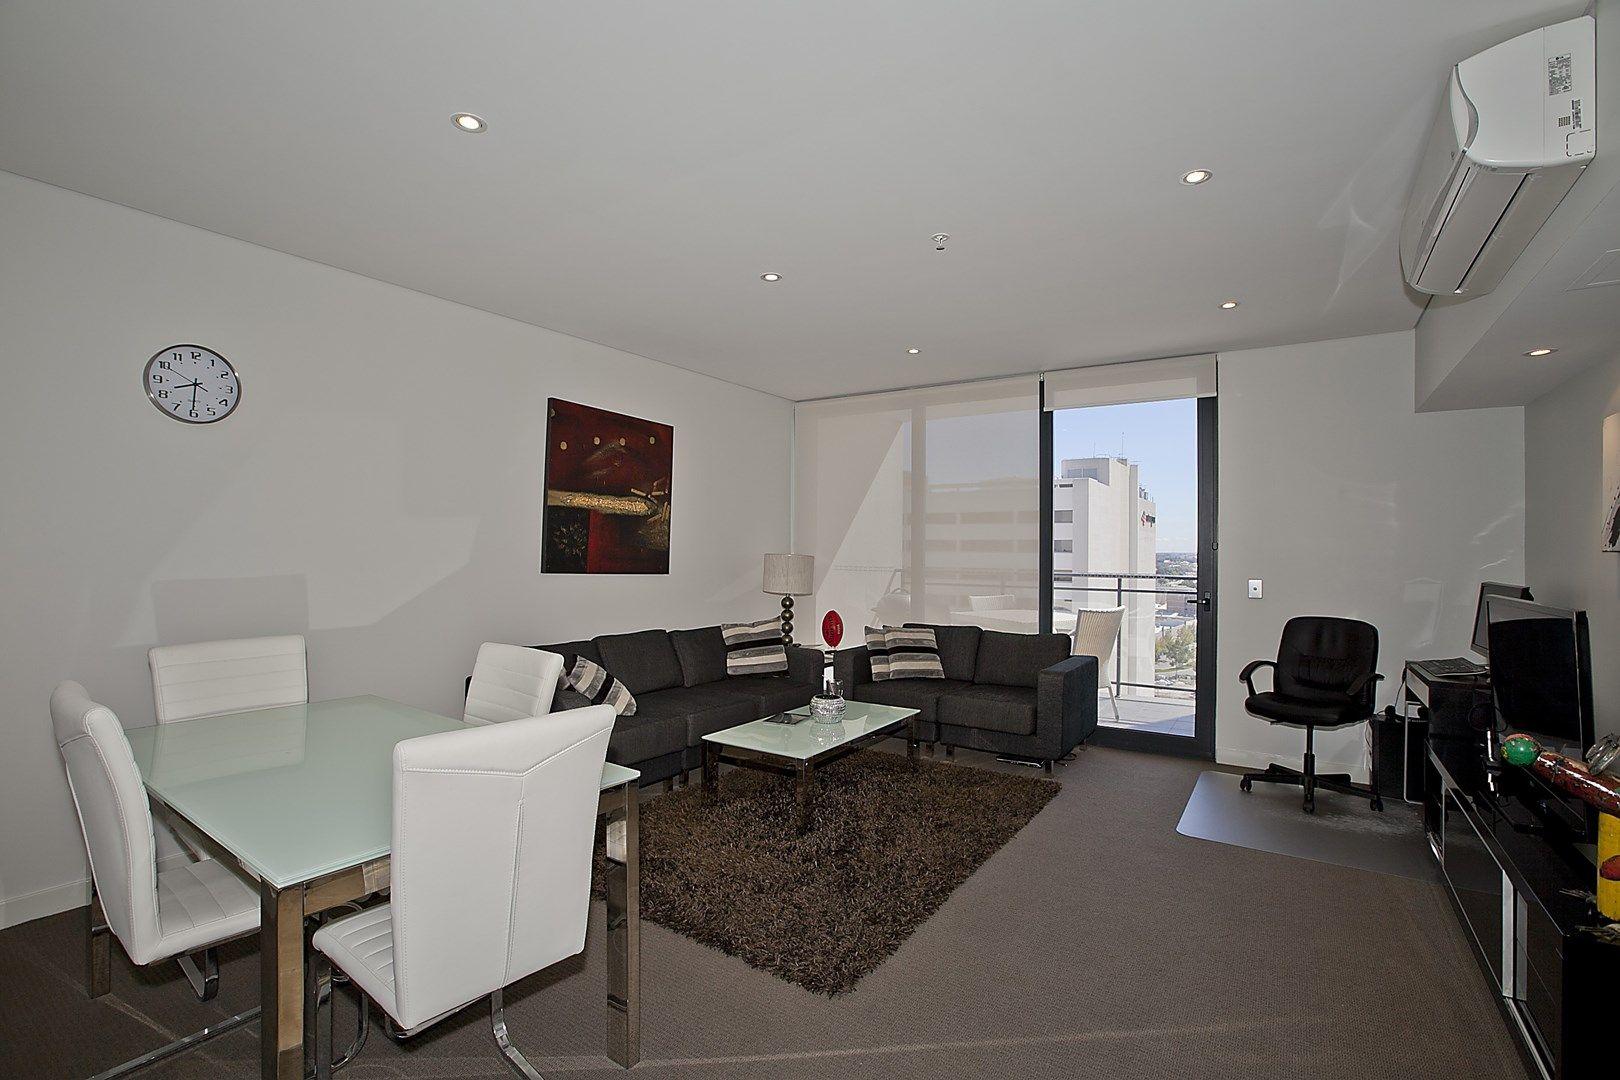 1 bedrooms Apartment / Unit / Flat in 86/101 Murray Street PERTH WA, 6000